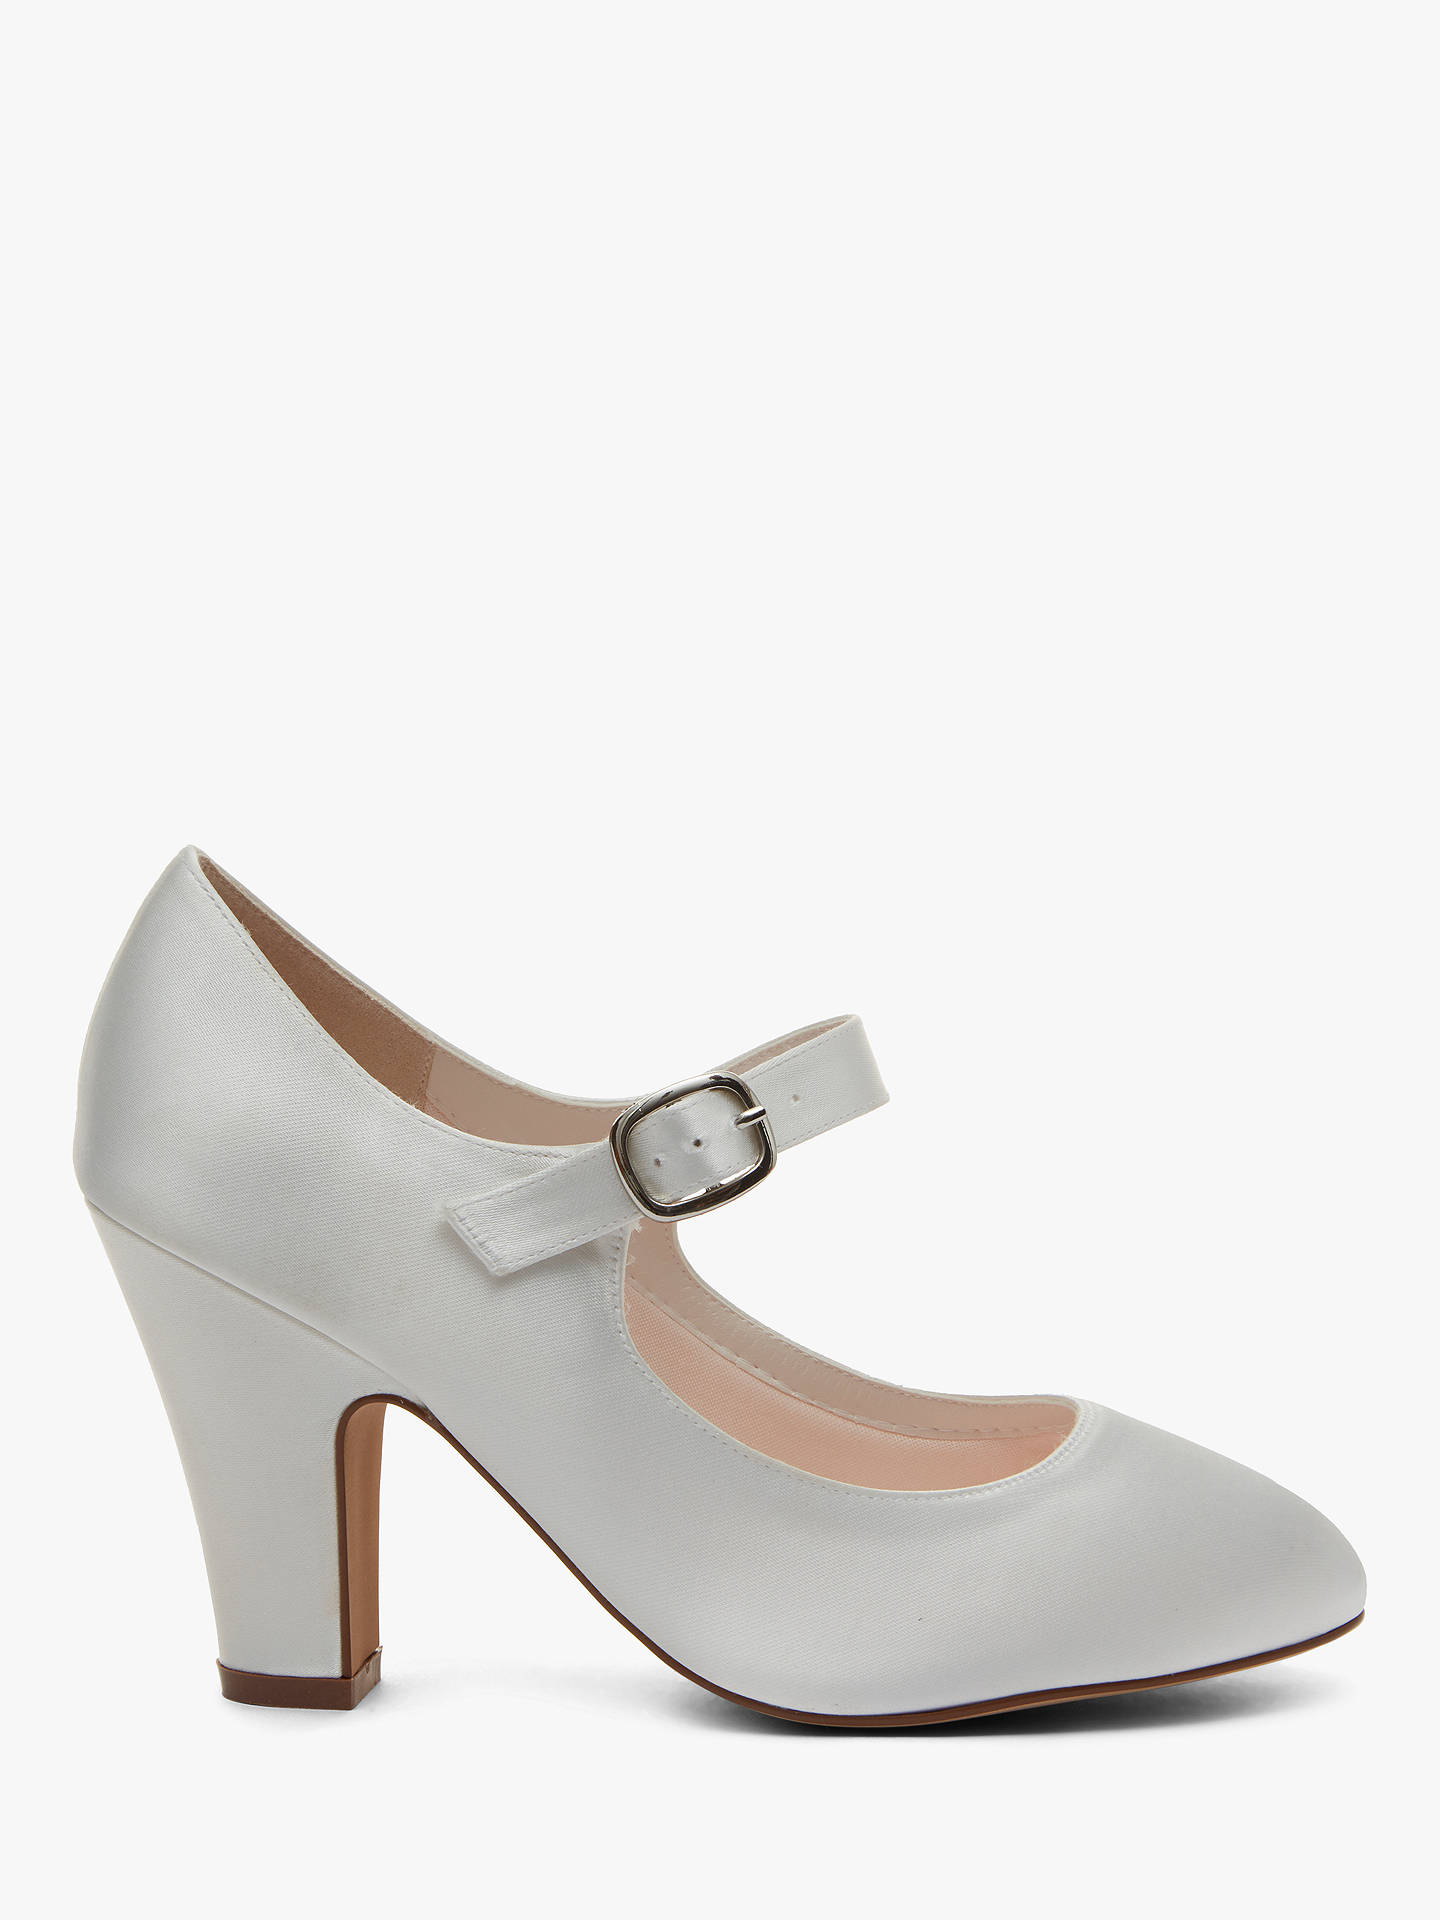 BuyRainbow Club Madeline Block Heeled MJ Shoes c5f6ea13c